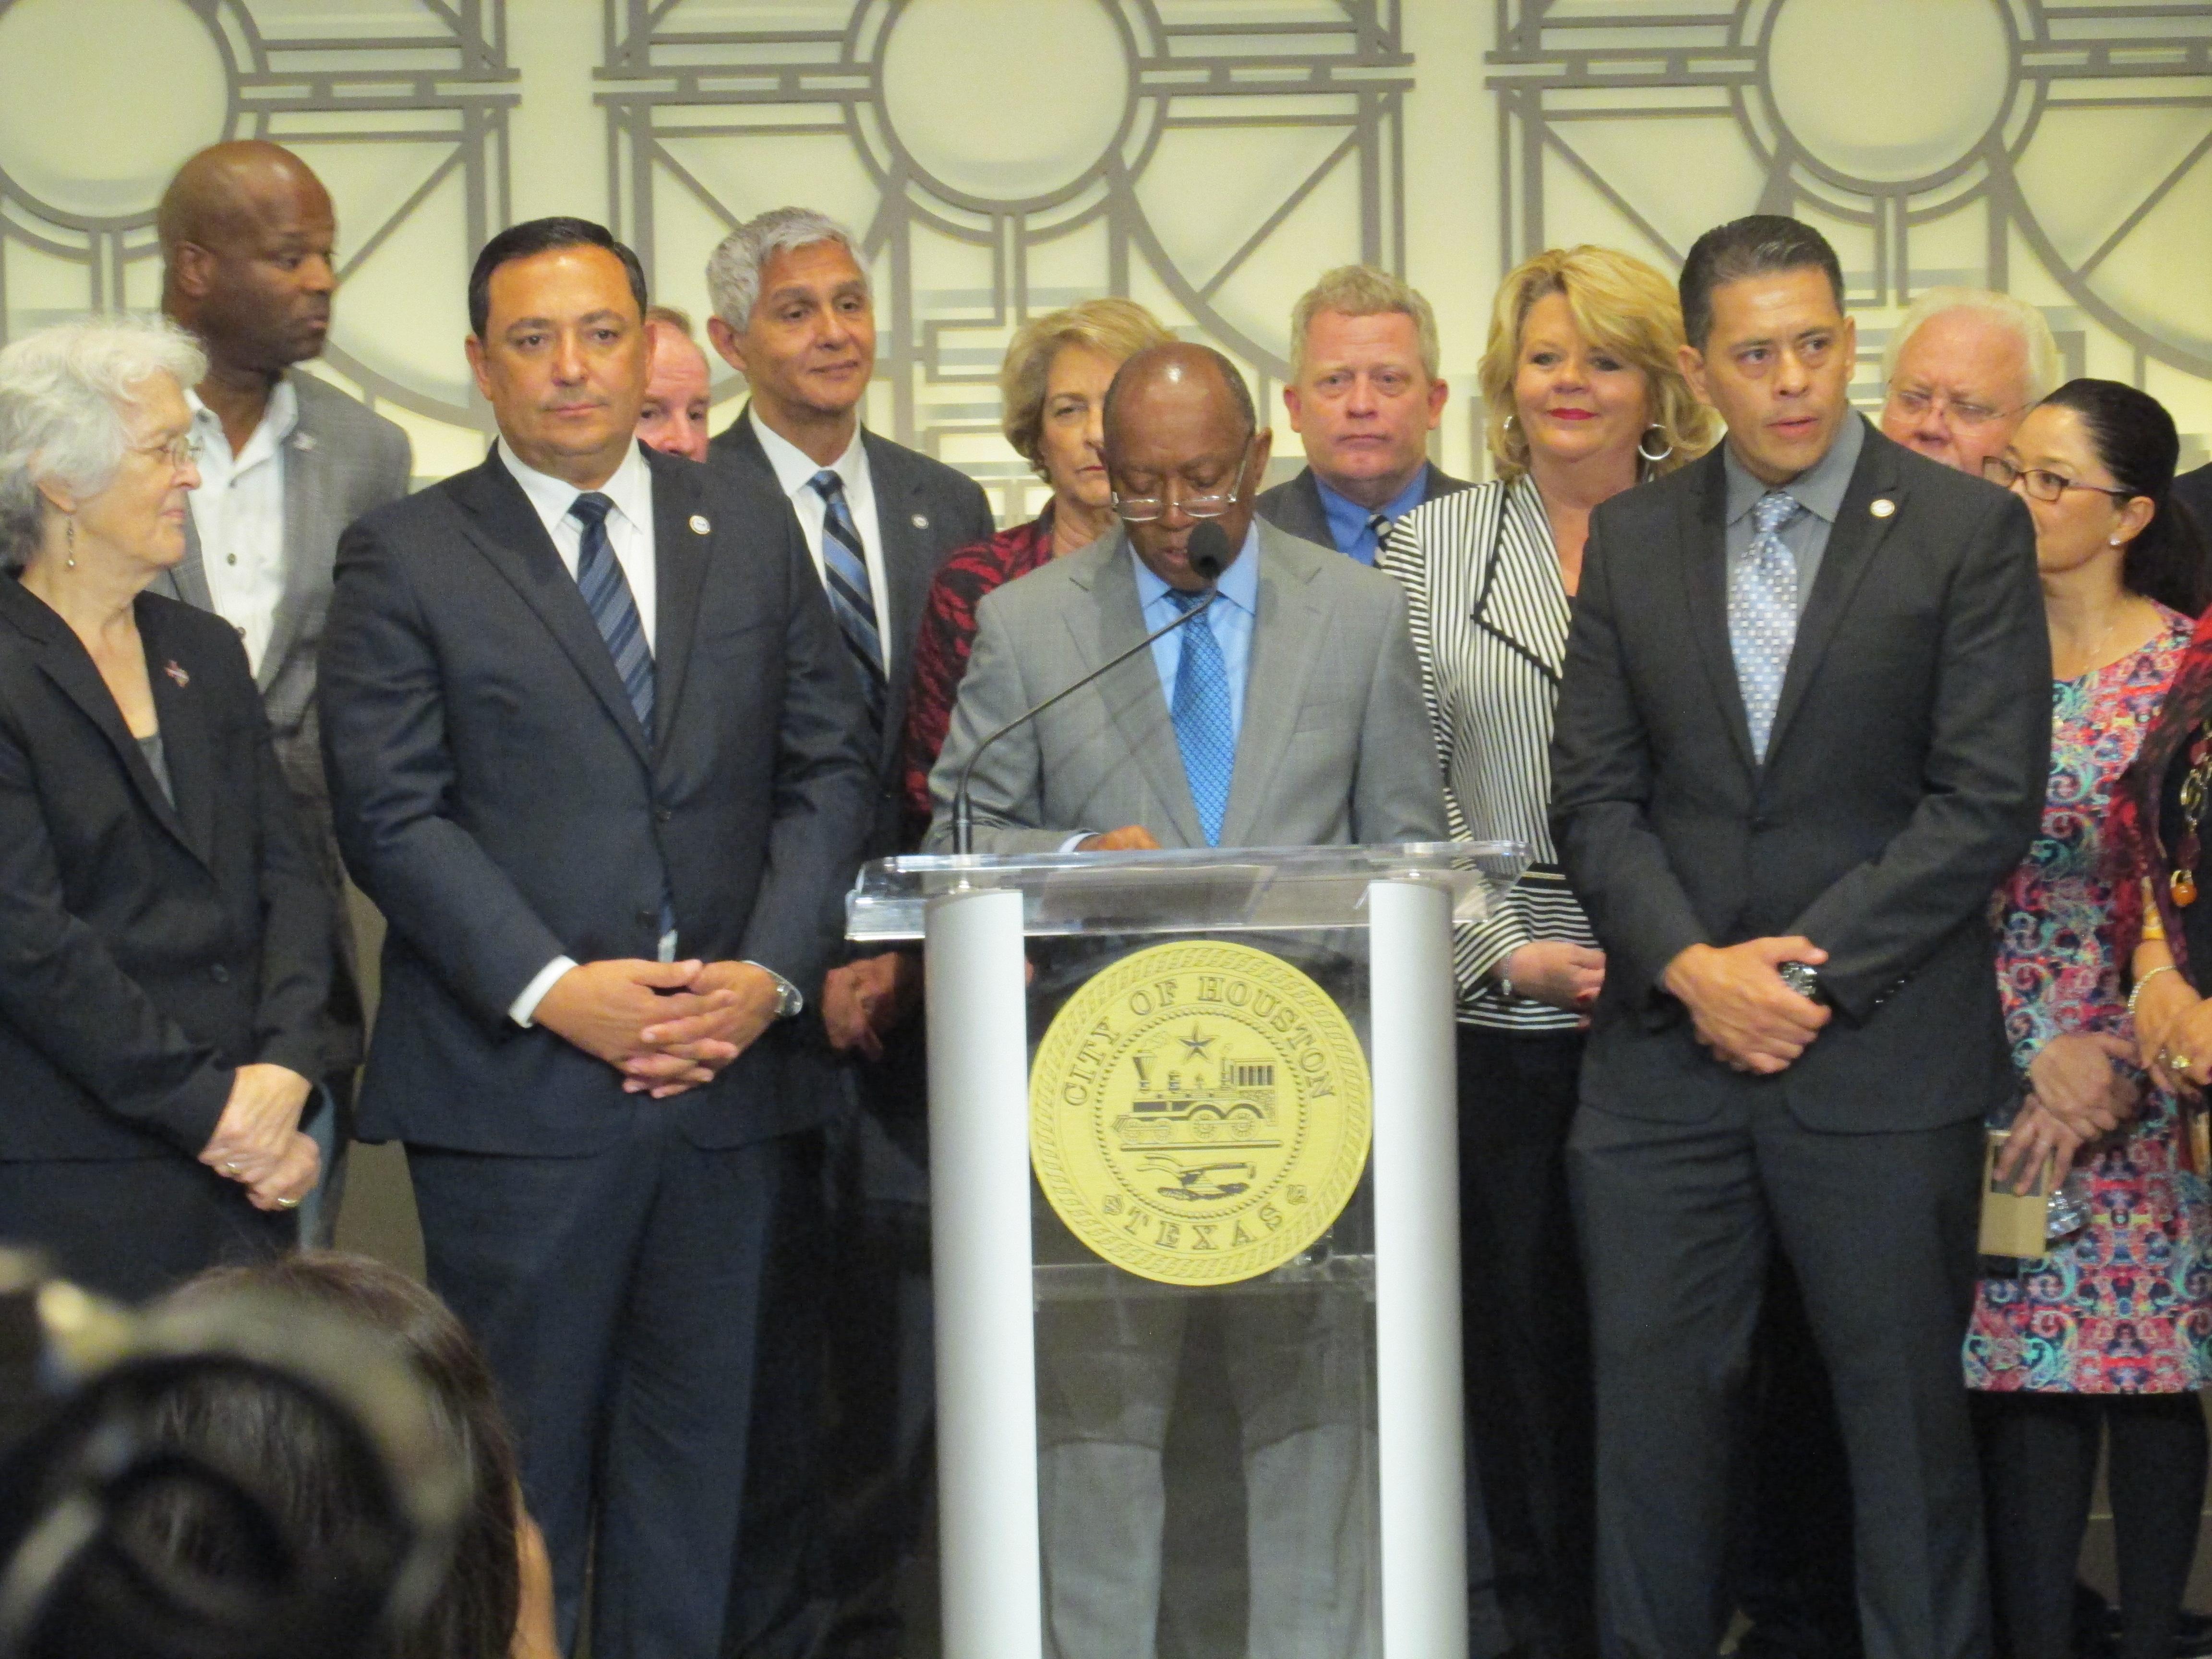 From L to R: Art Acevedo, Mayor Sylvester Turner, Samuel Peña